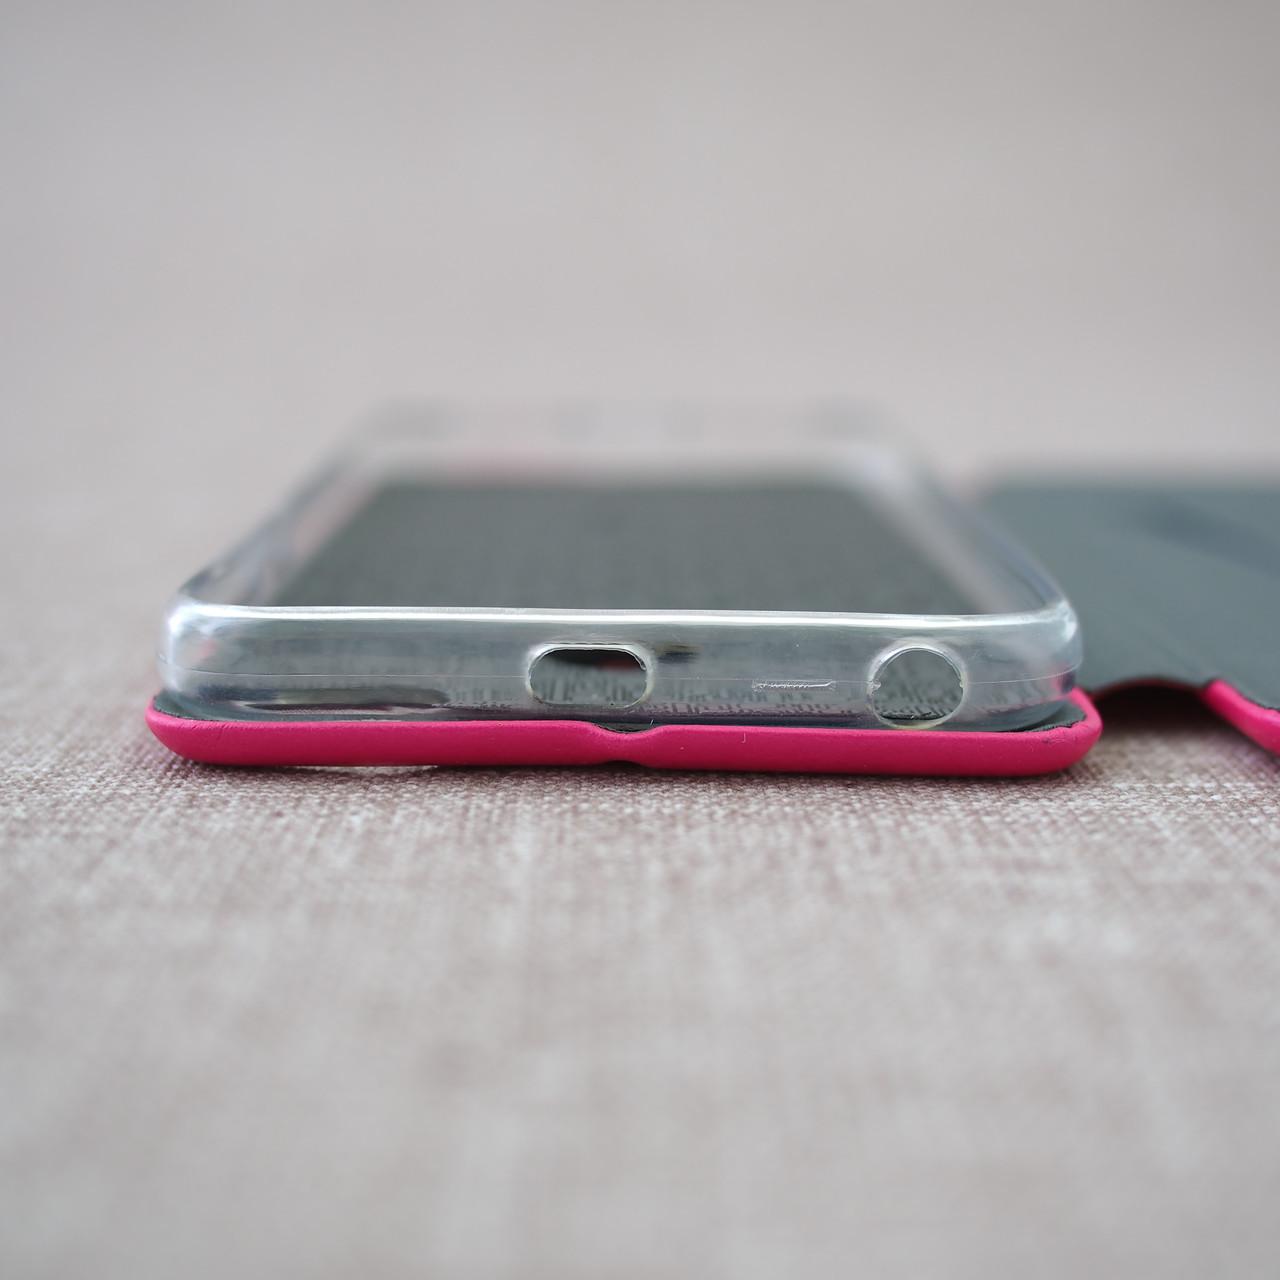 Чехлы для Xiaomi Redmi 4X G-Case redmi 4x pink Для телефона